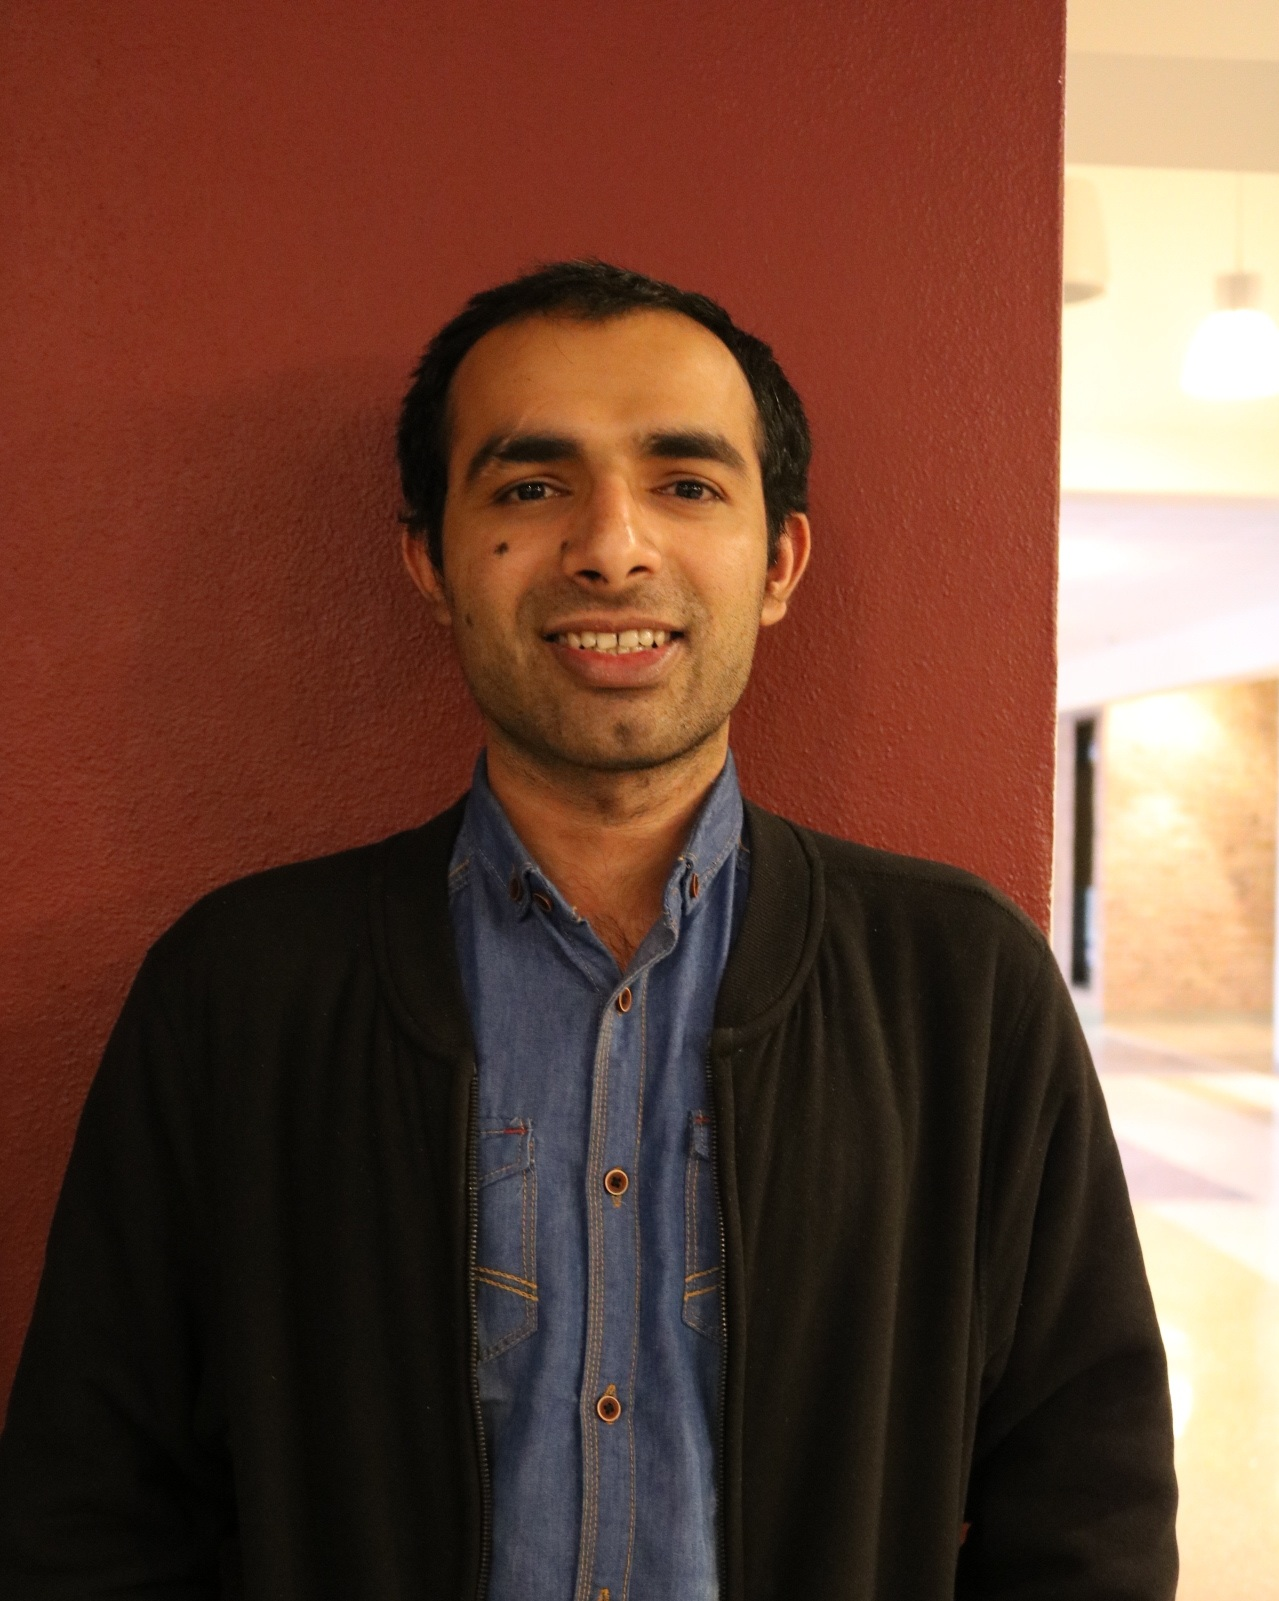 Nabeel Ahmad, Vice President of the Cricket Club. Photo by Madison Hunter